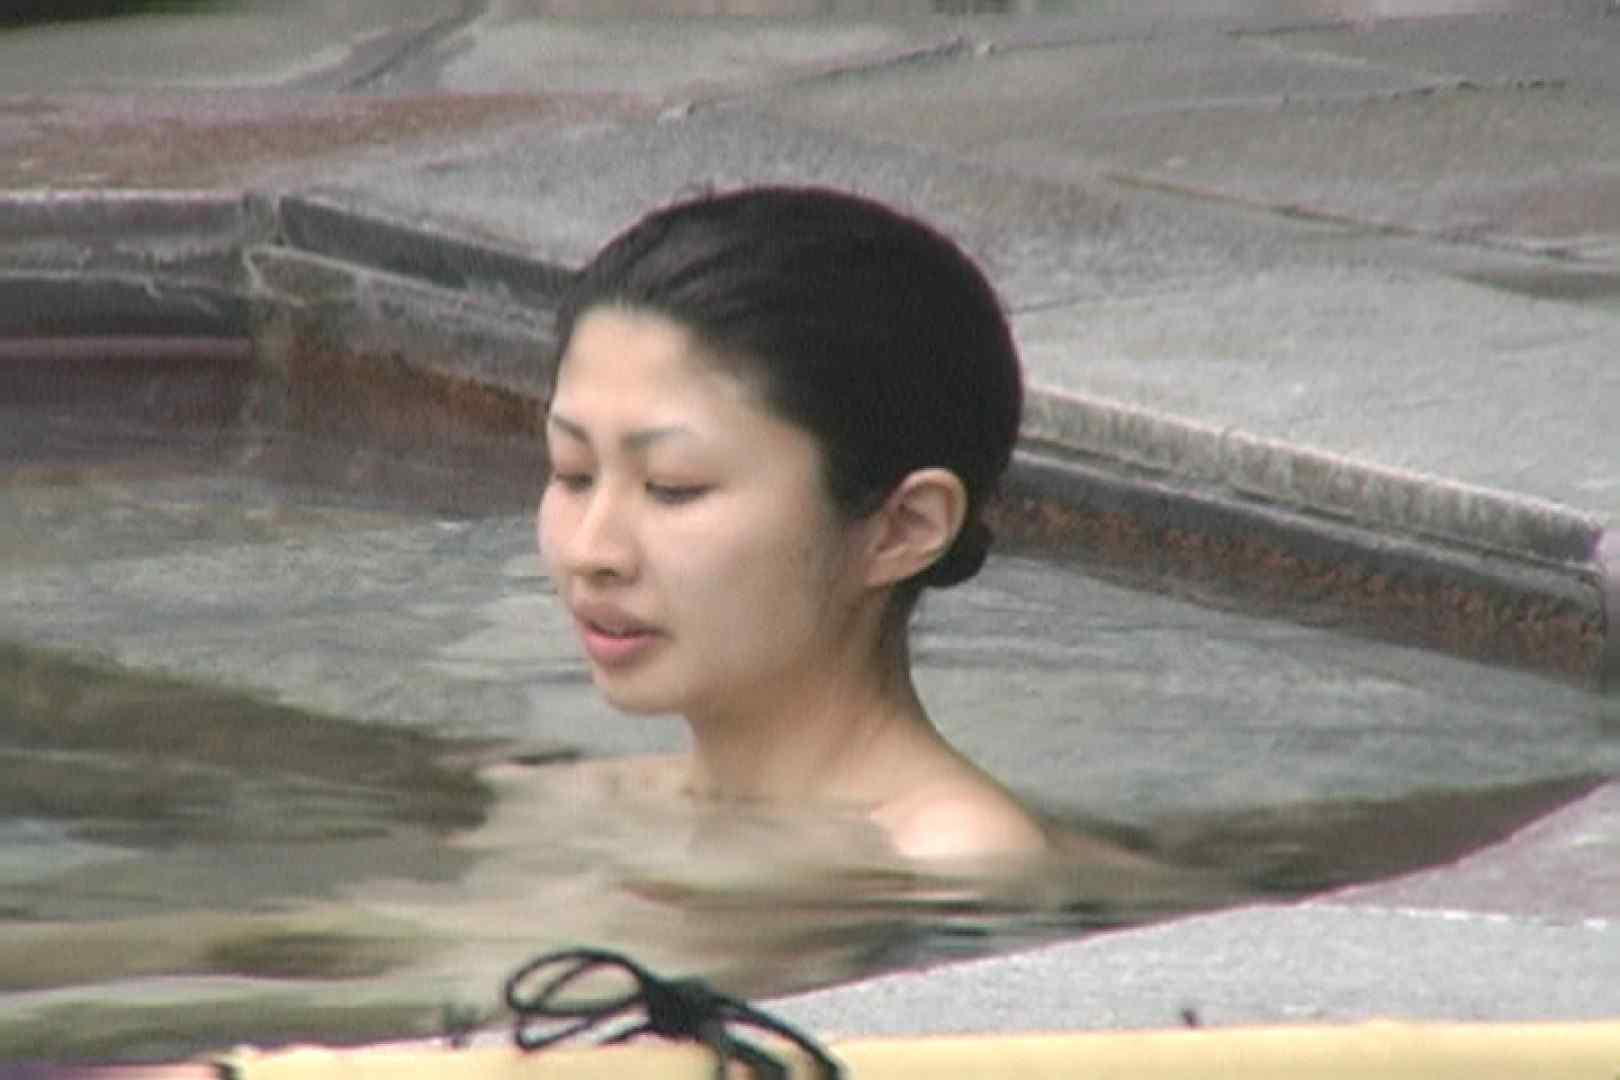 Aquaな露天風呂Vol.642 美しいOLの裸体 | 露天風呂突入  86pic 1